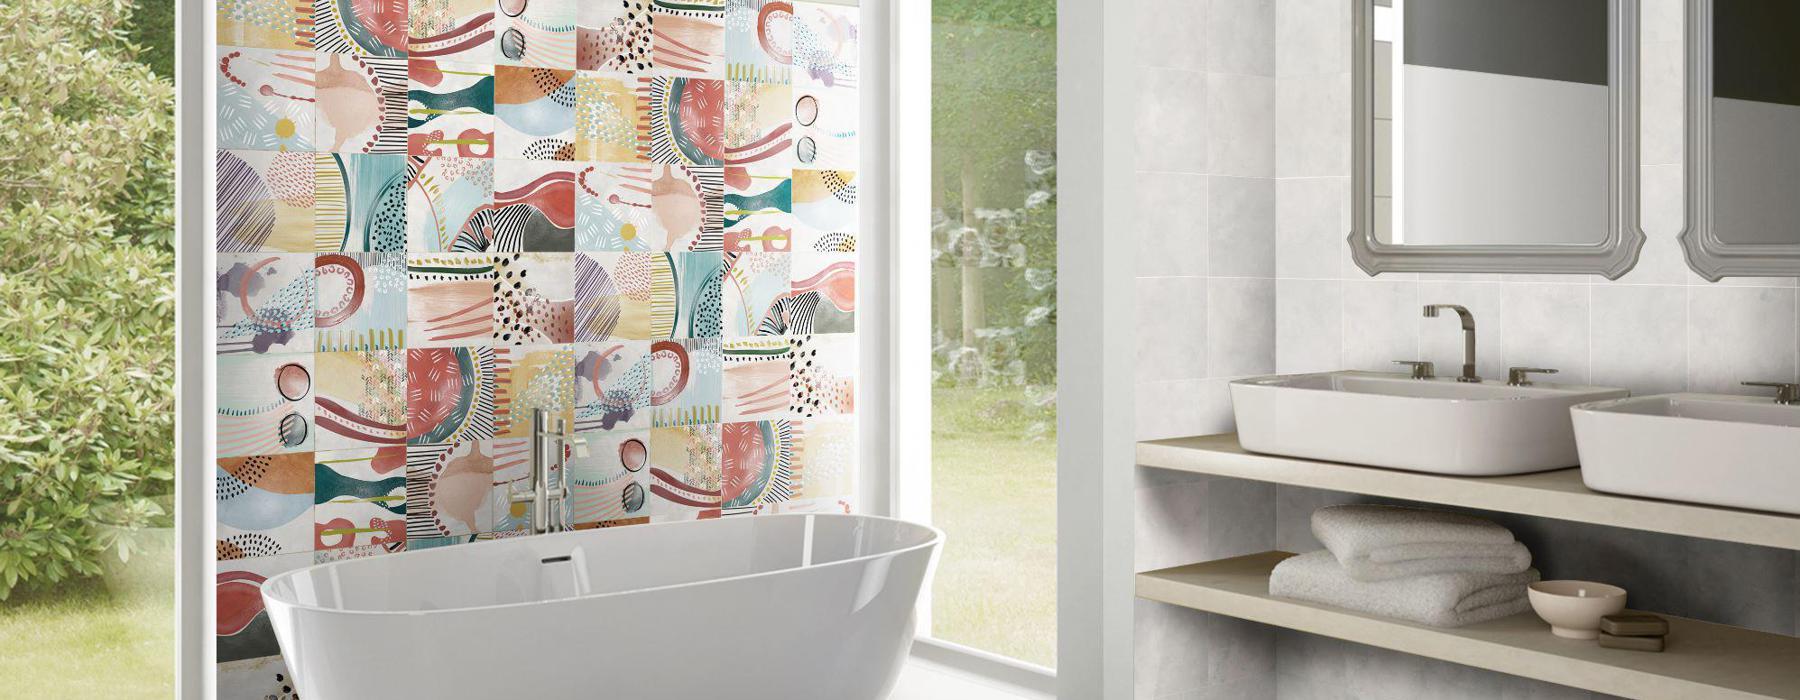 mix and match decor tiles codicer 95 cersaie 2019